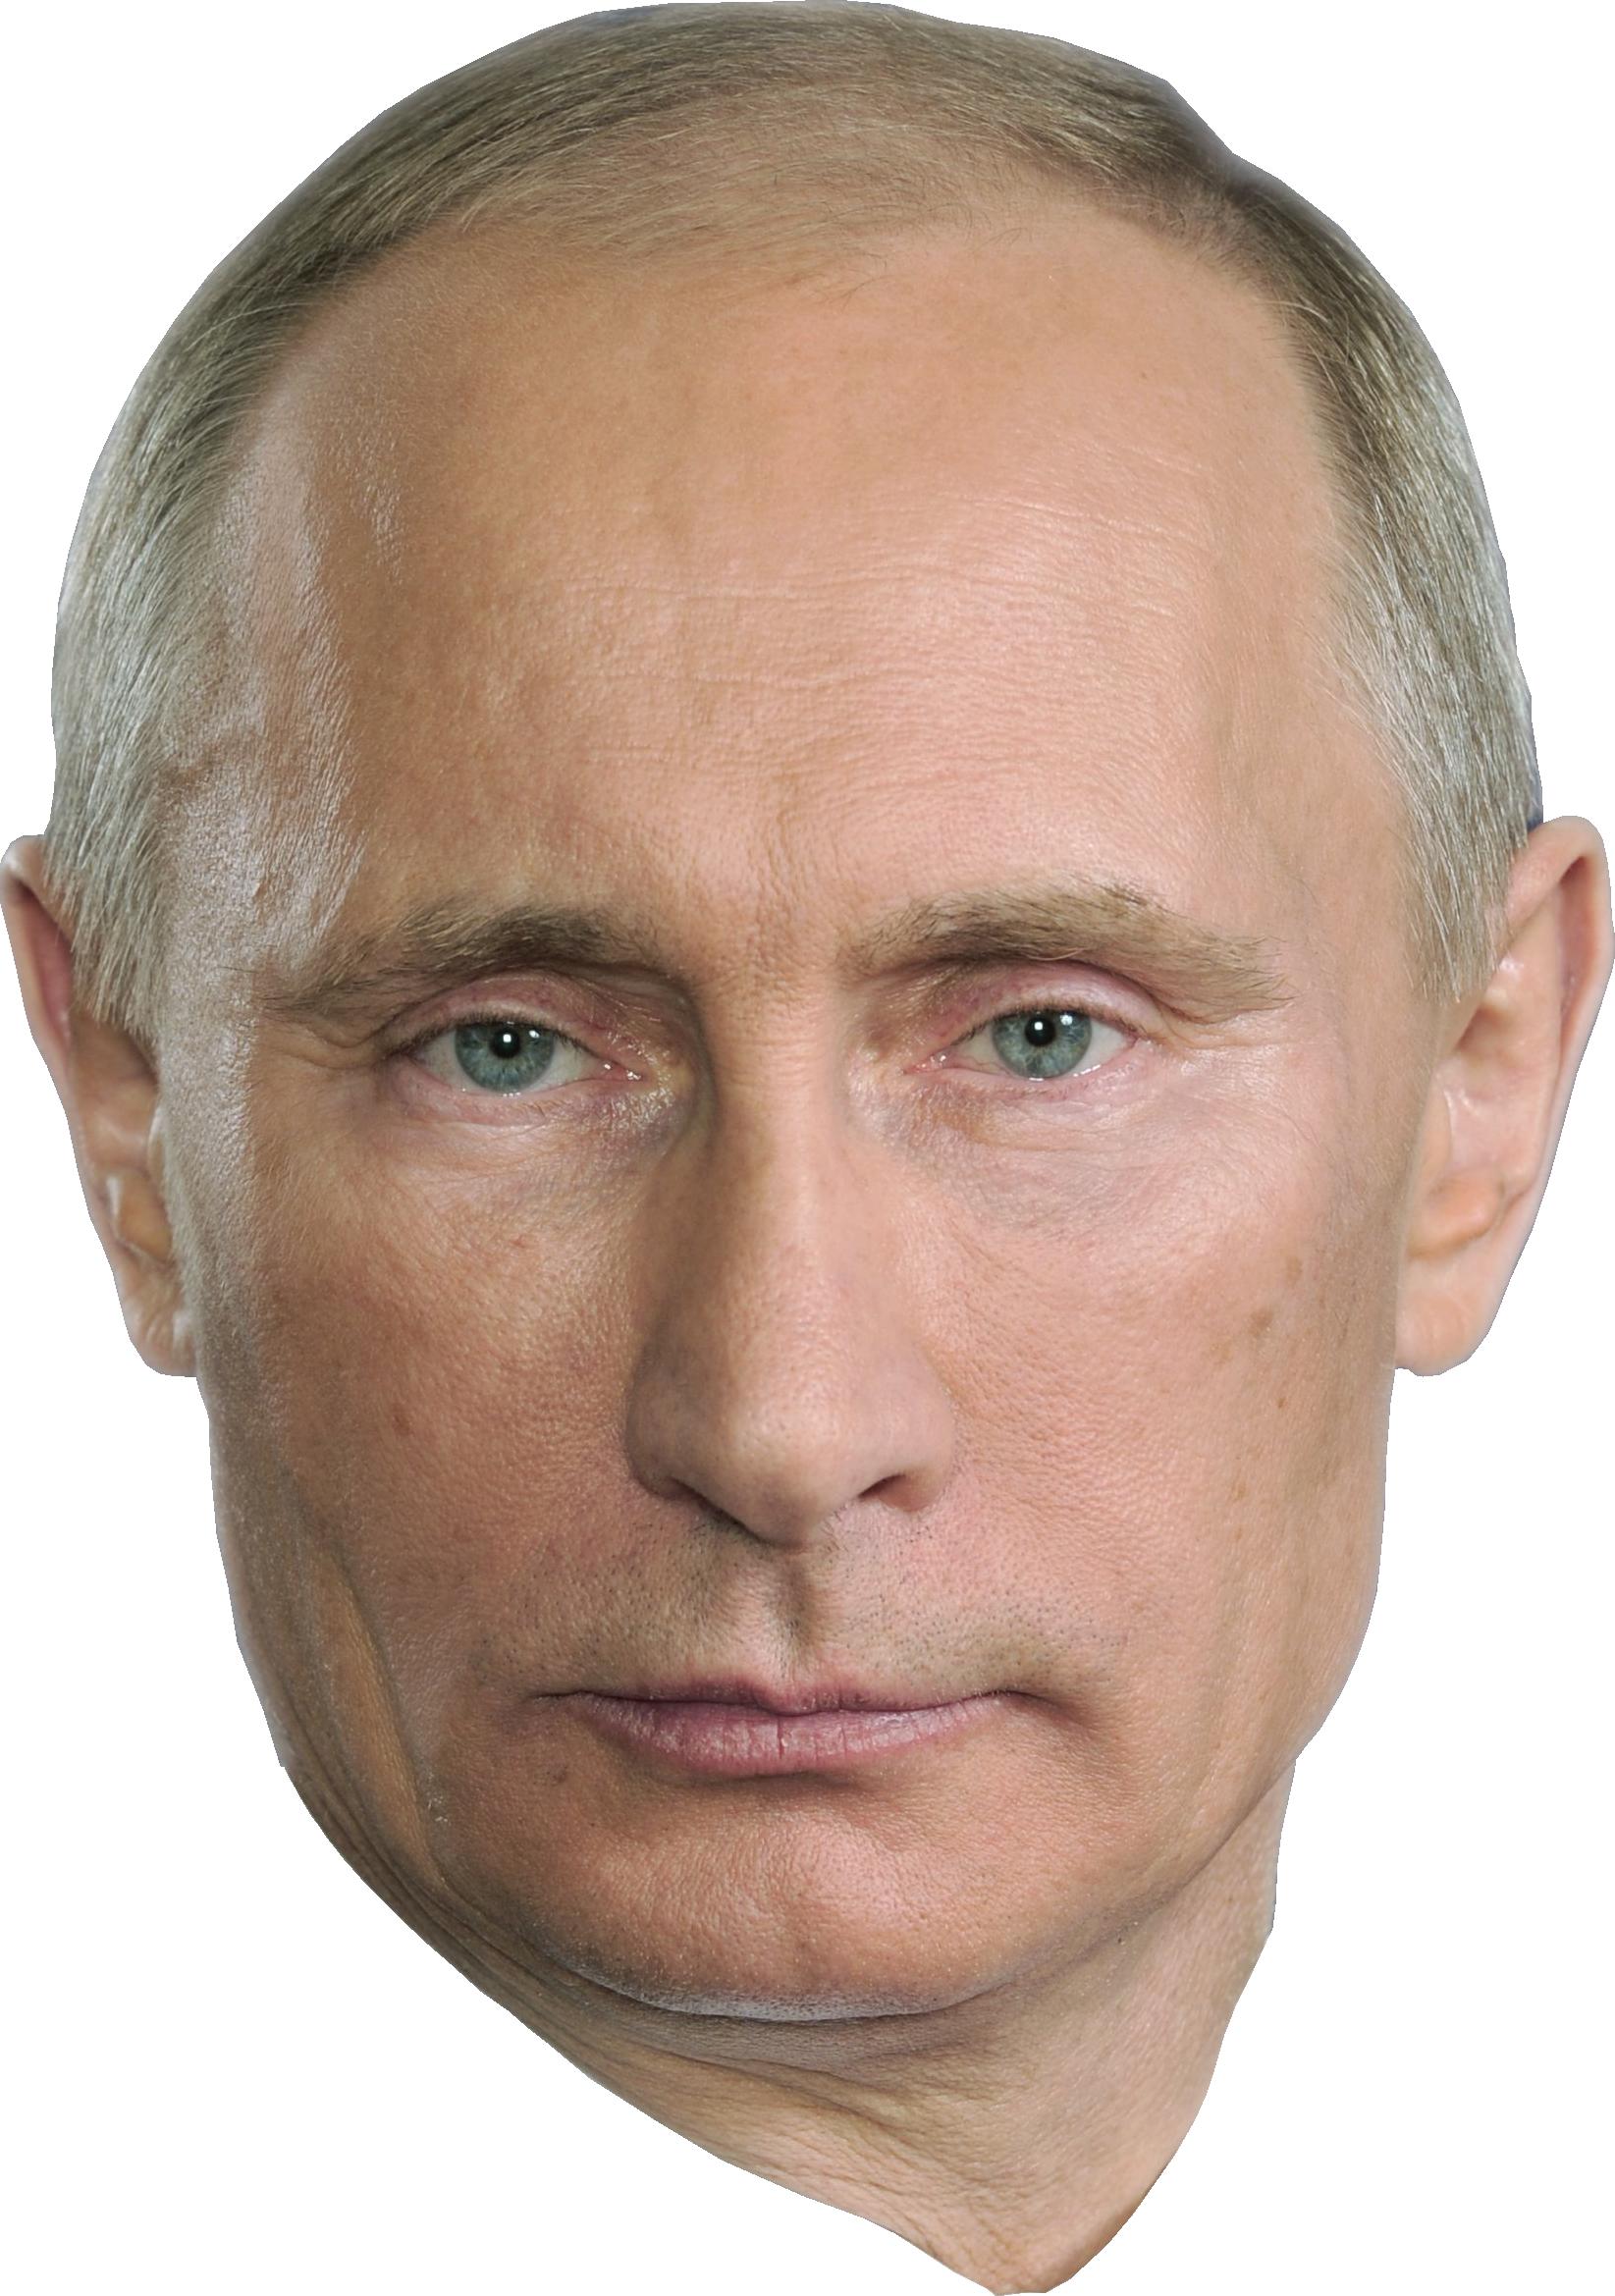 Man Face PNG Image.